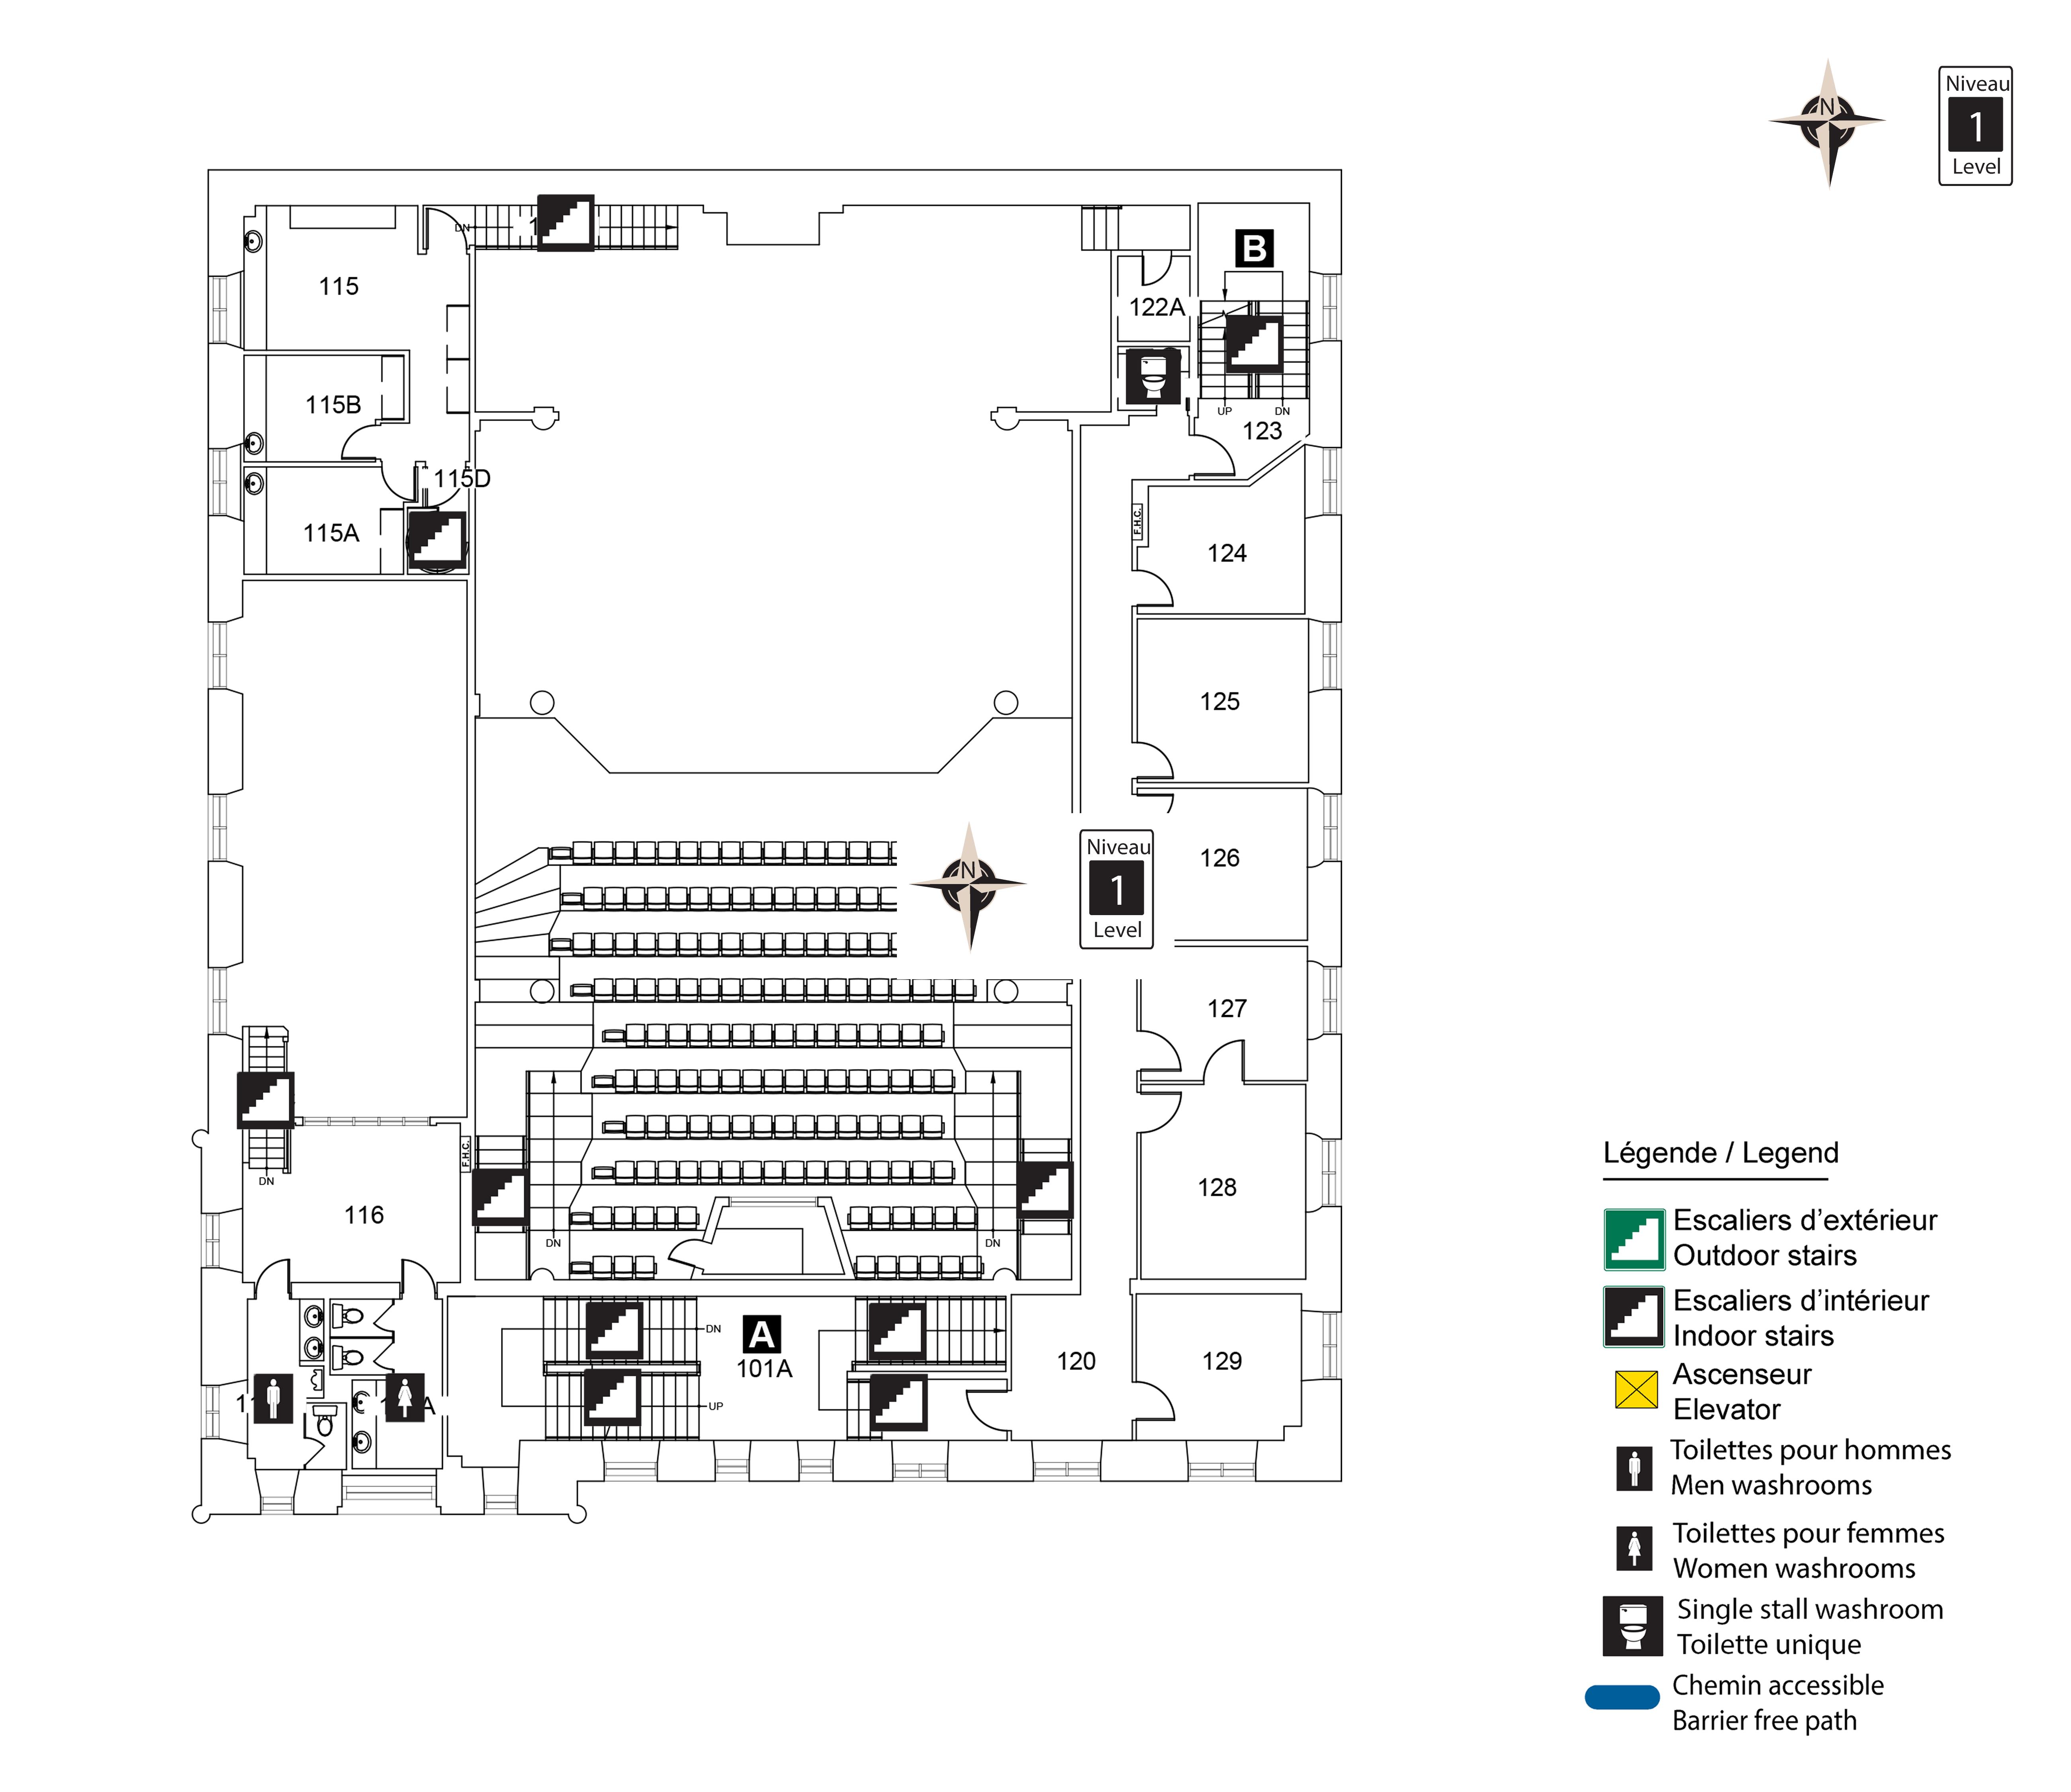 Academic hall - 01-2